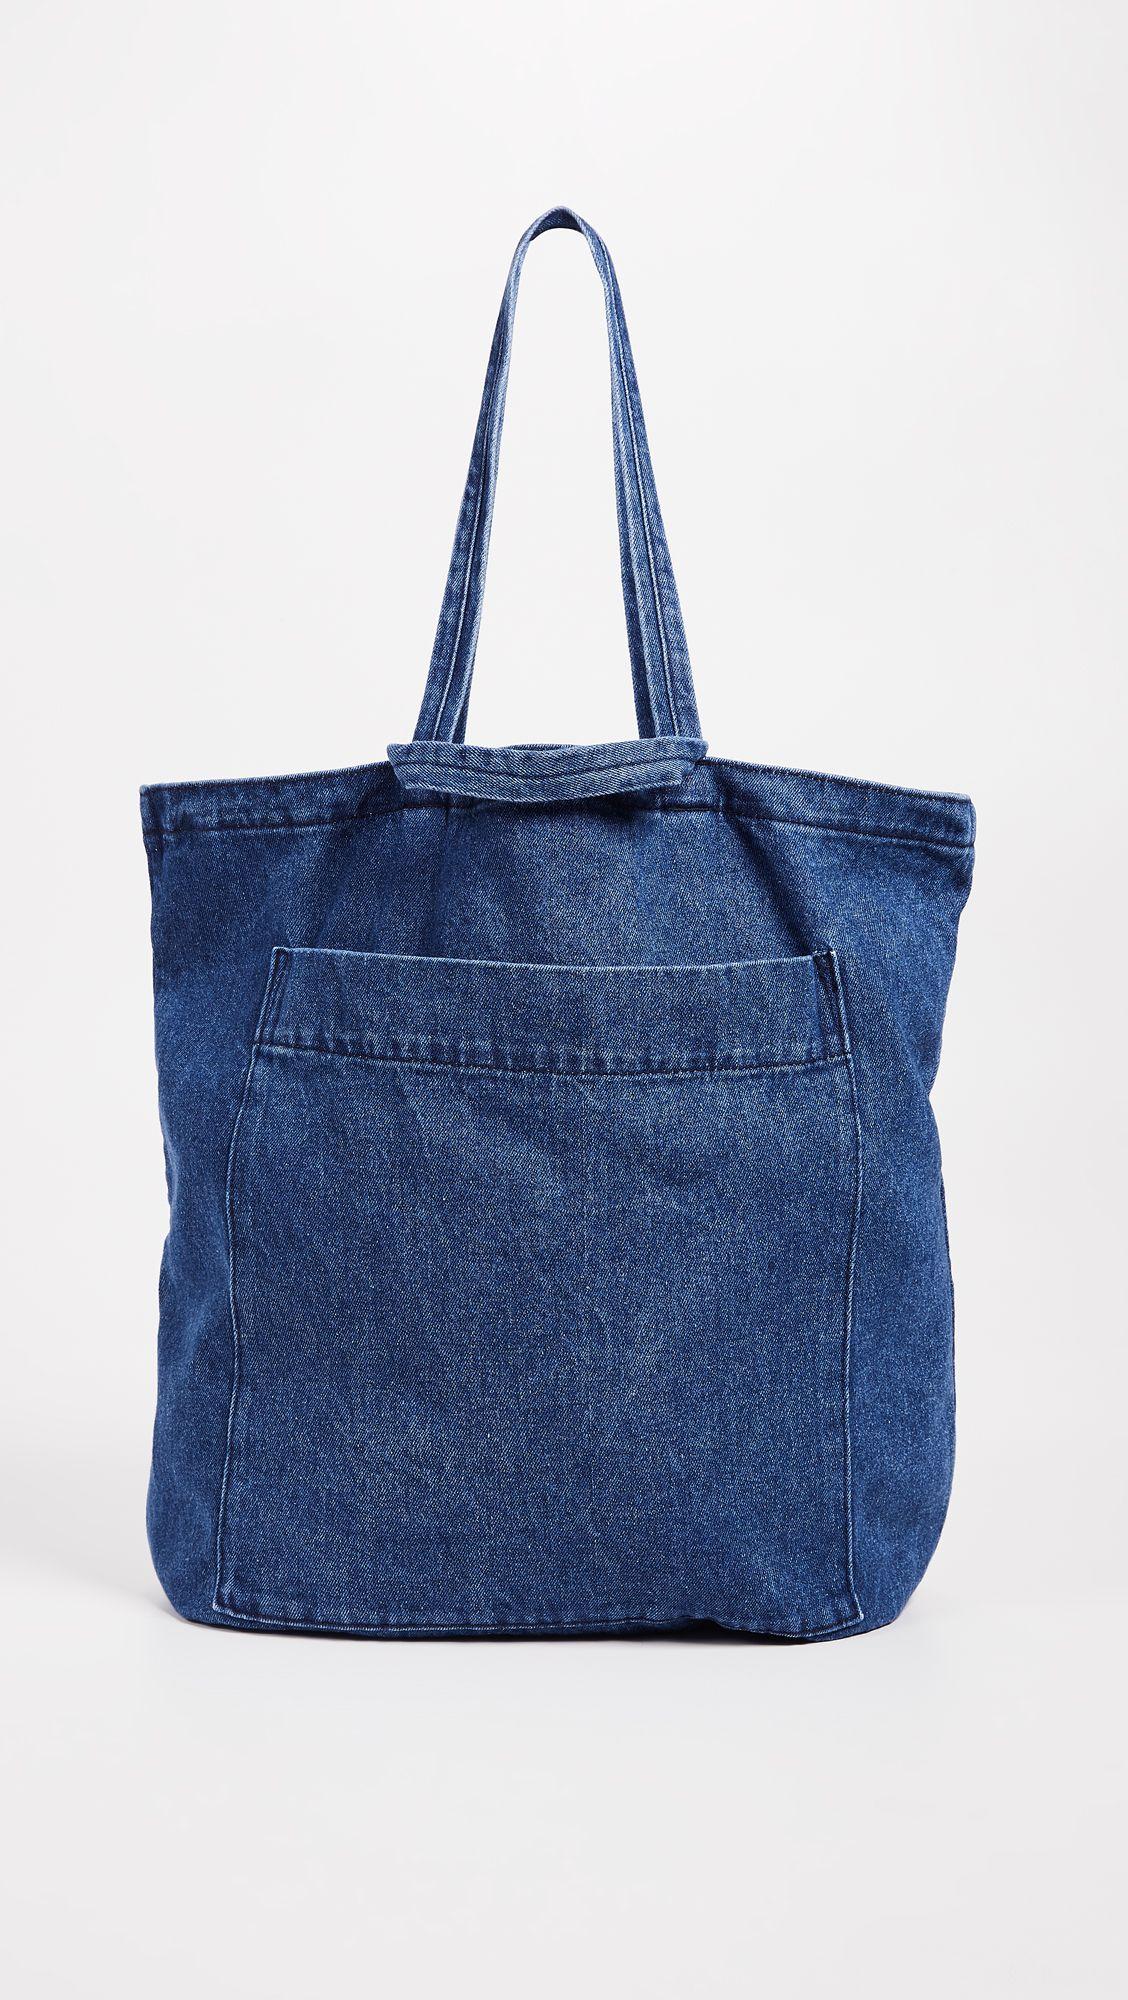 8fc4a3e5d93 Pin by Rita Masada on Sewing Ideas | Bags, Pocket, Tote bag